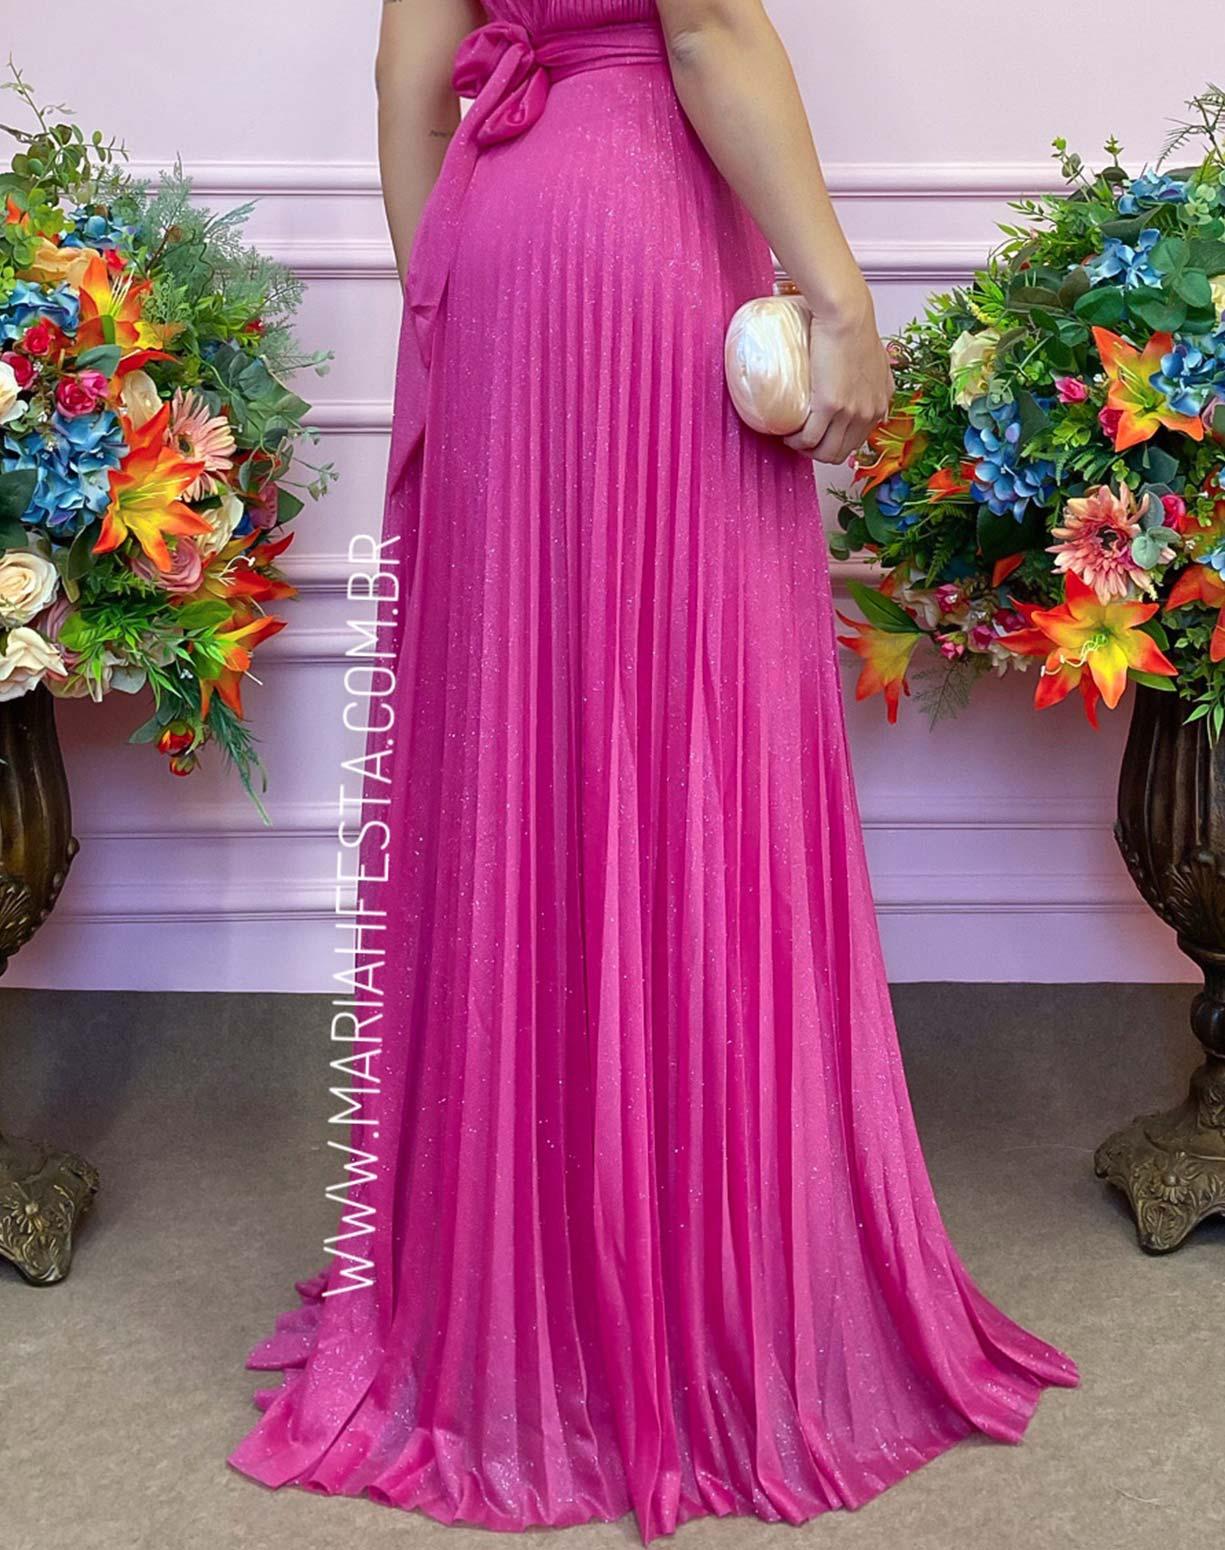 Vestido Rosa Pink Tule Glitter Plissado